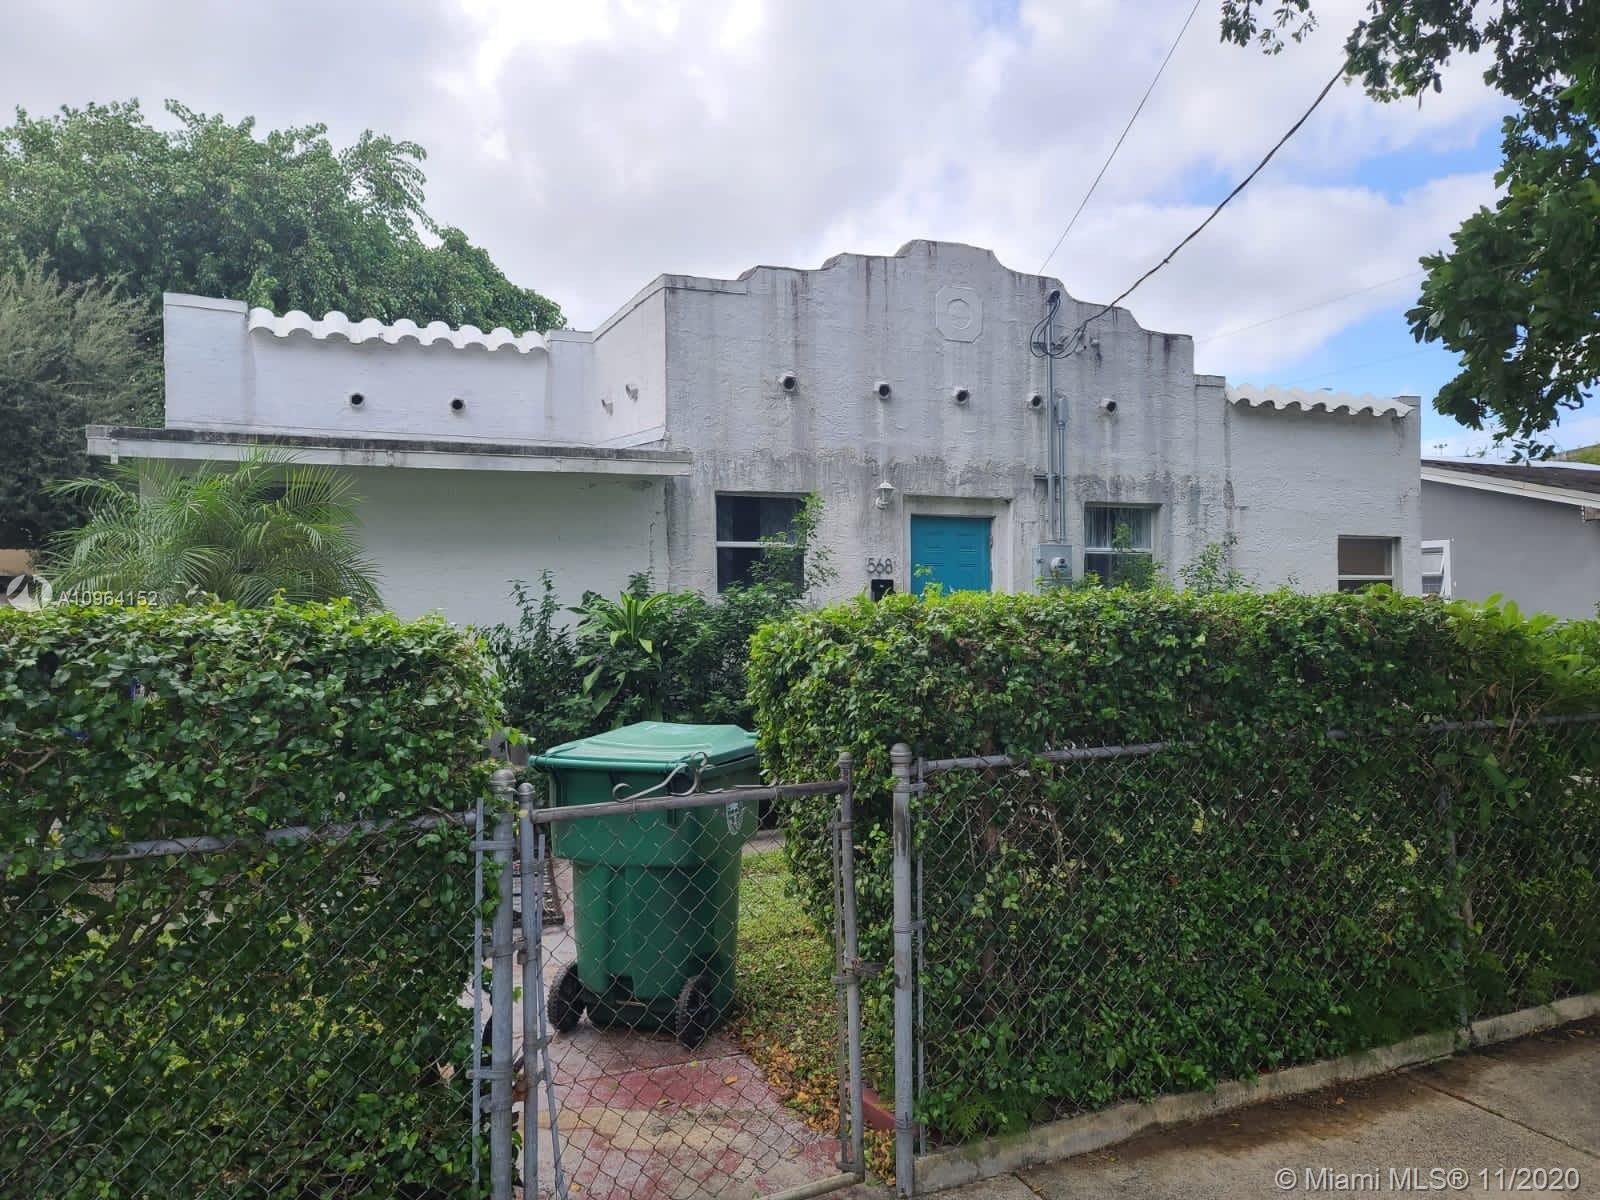 Bay Vista Park - 568 NW 43rd St, Miami, FL 33127